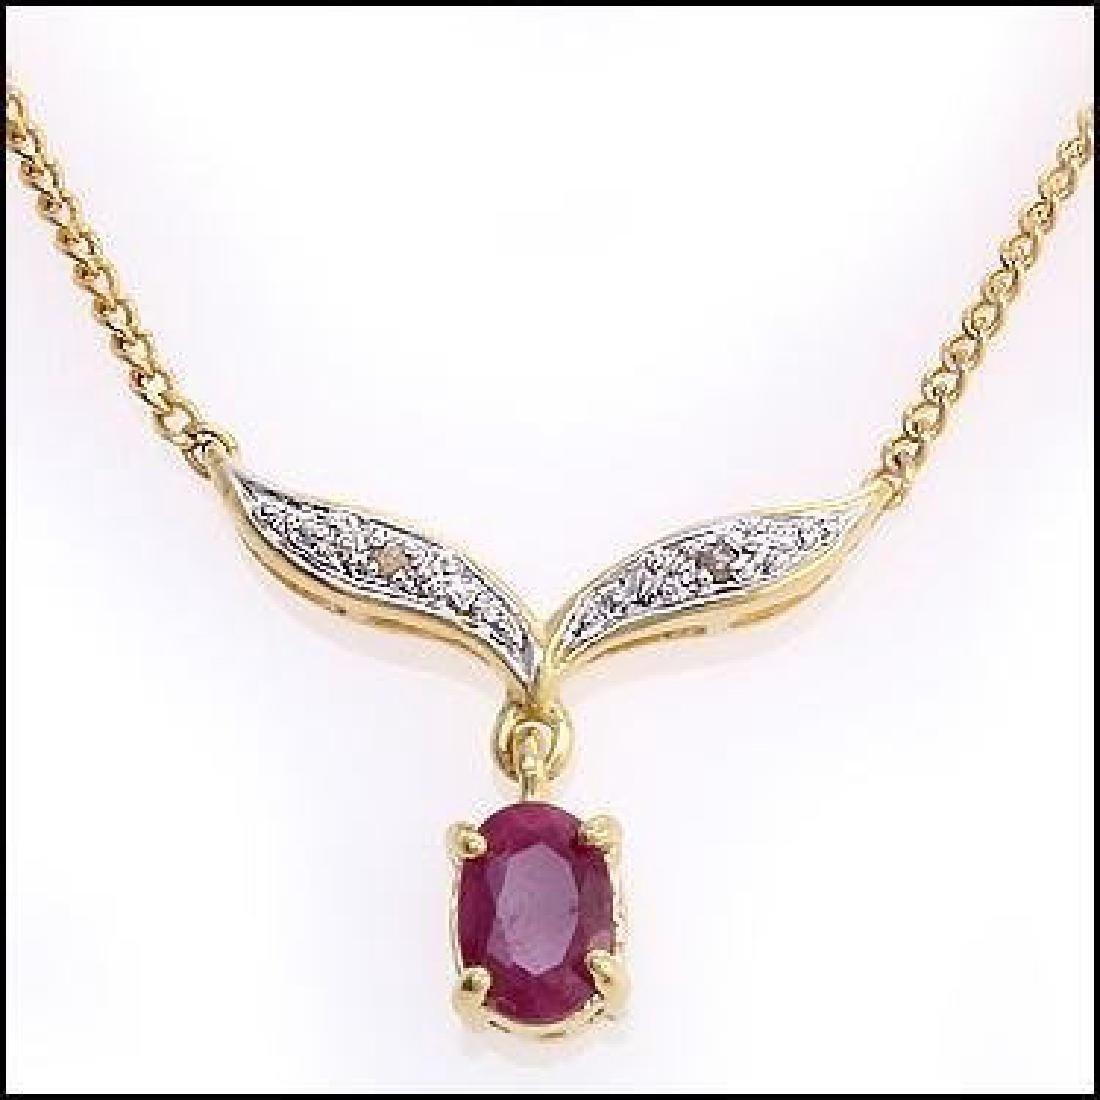 2.91 CT Ruby & Diamond Designer Necklace $855 - 2